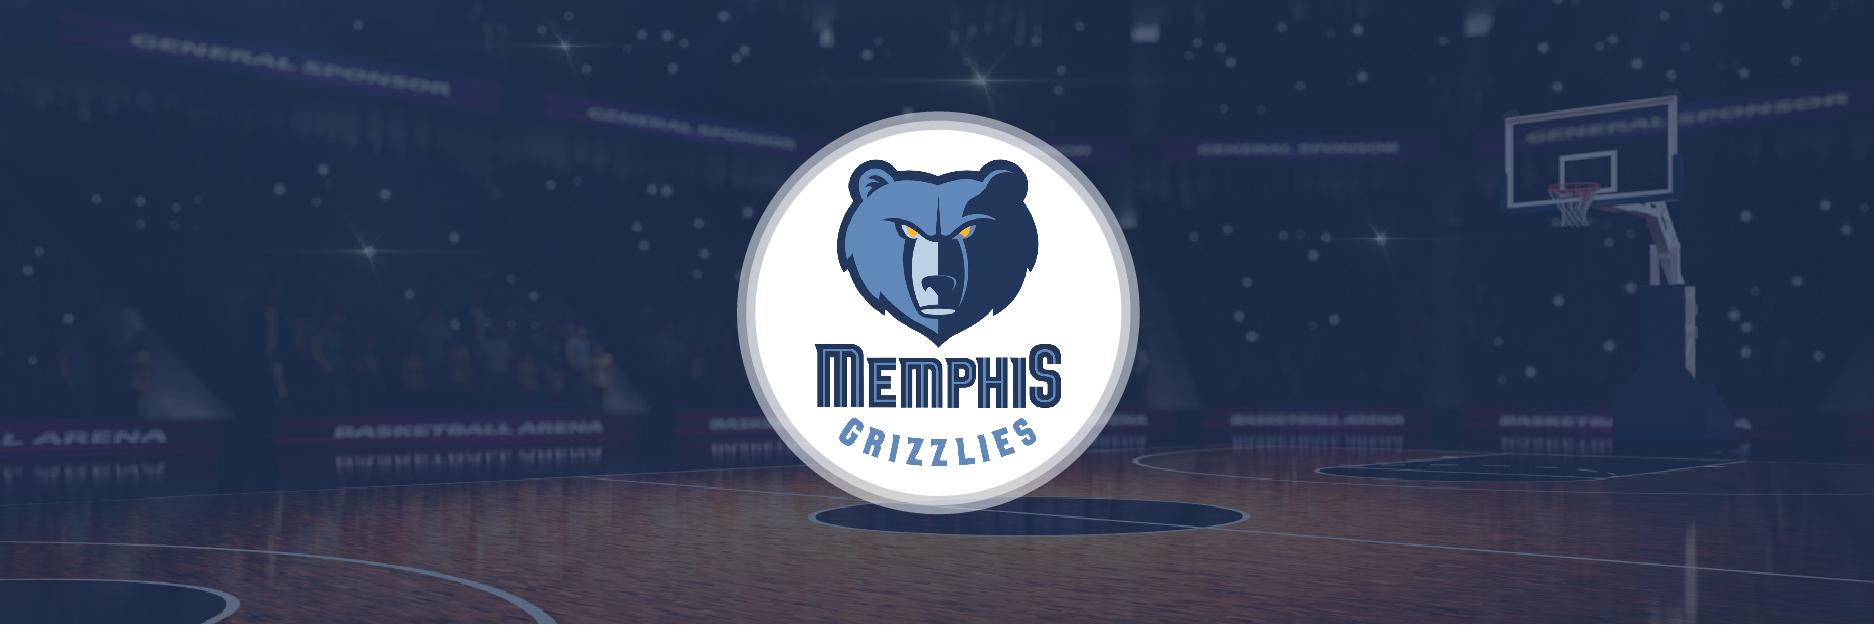 Memphis Grizzlies 2020 Season Analysis